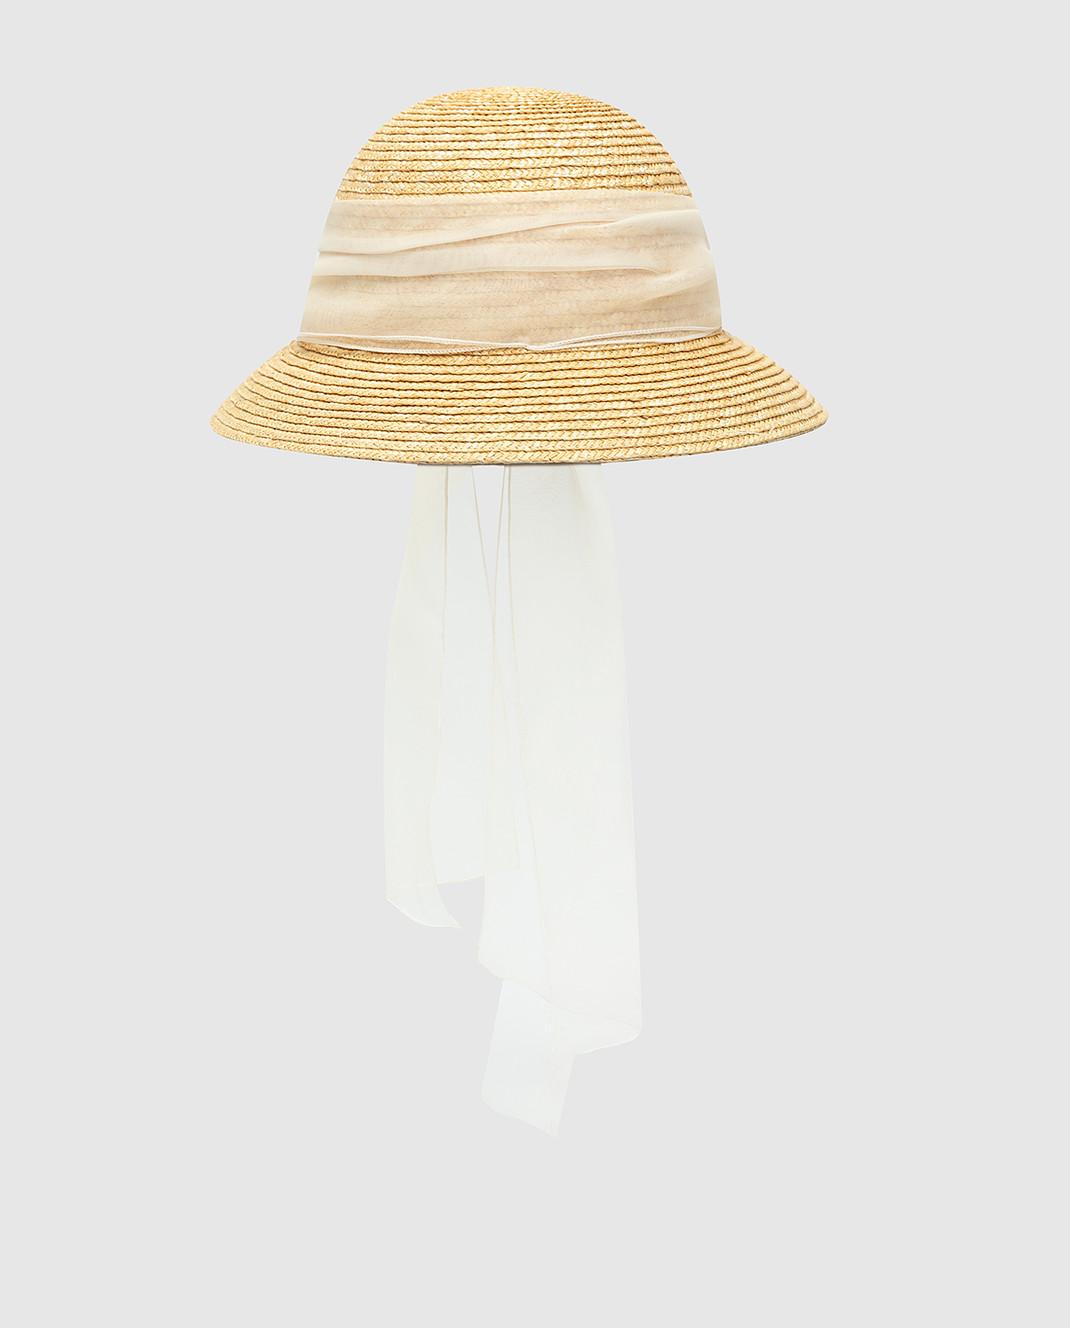 CAF Детская бежевая шляпа 020